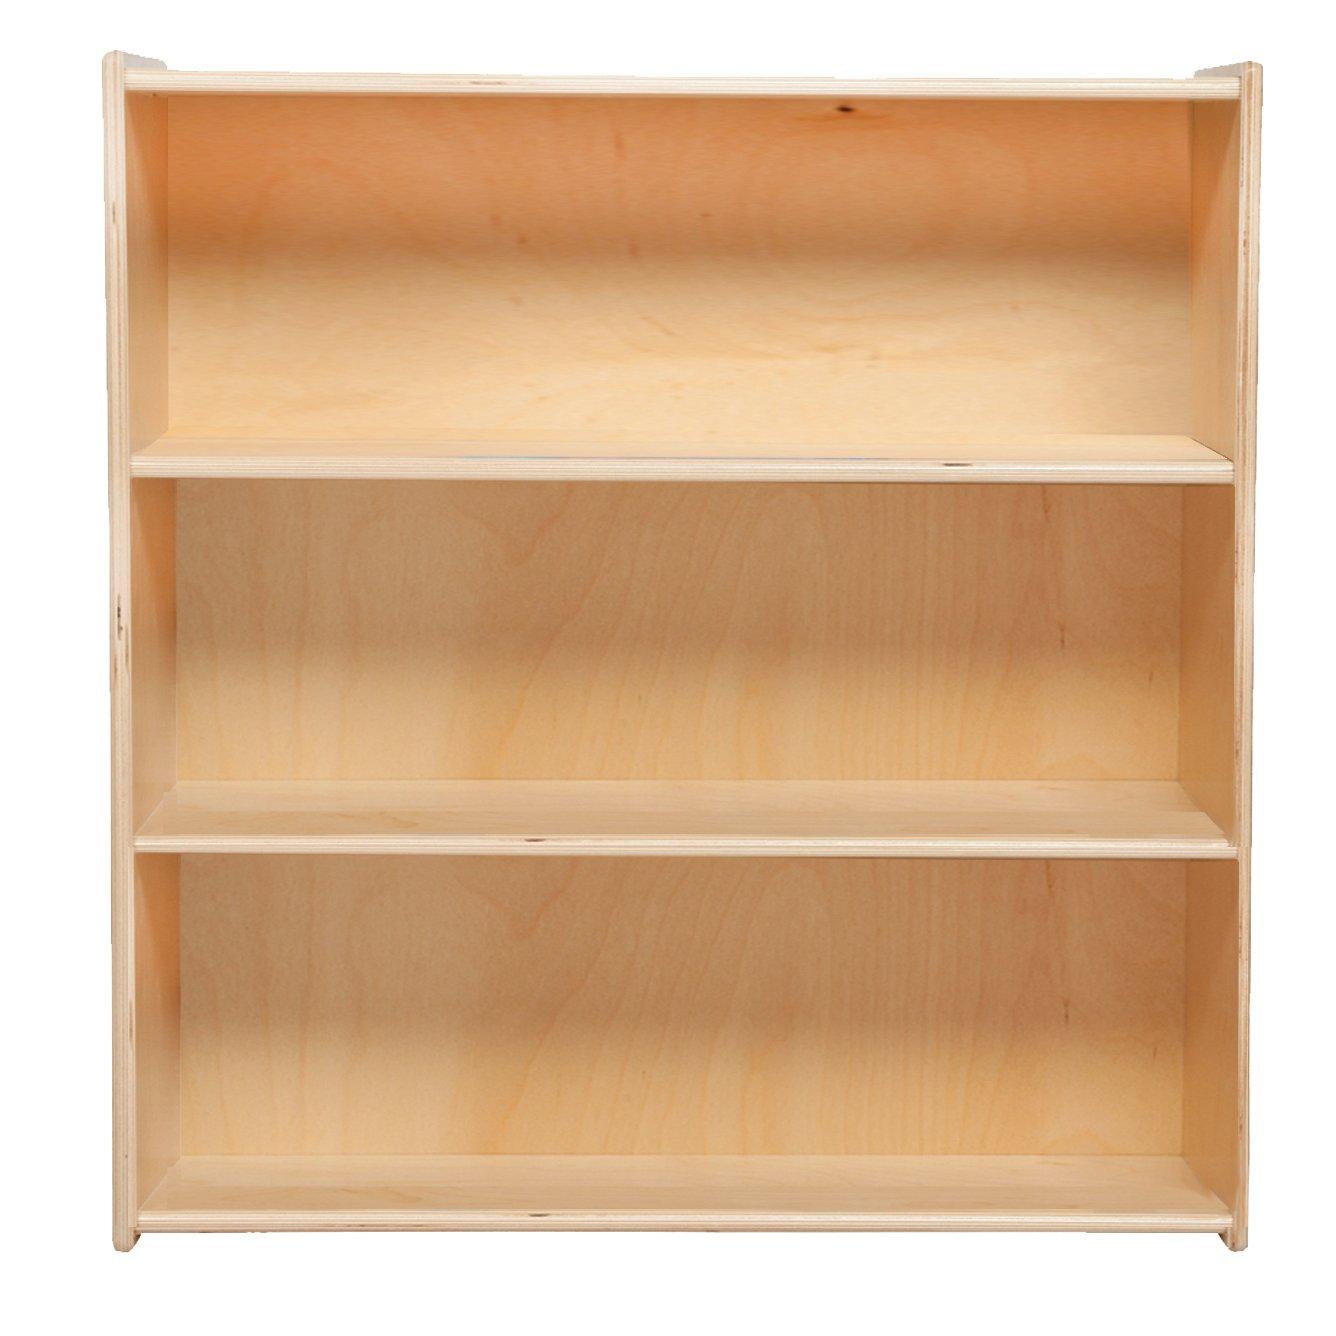 Contender C12936 Bookshelf, 33-7/8''H